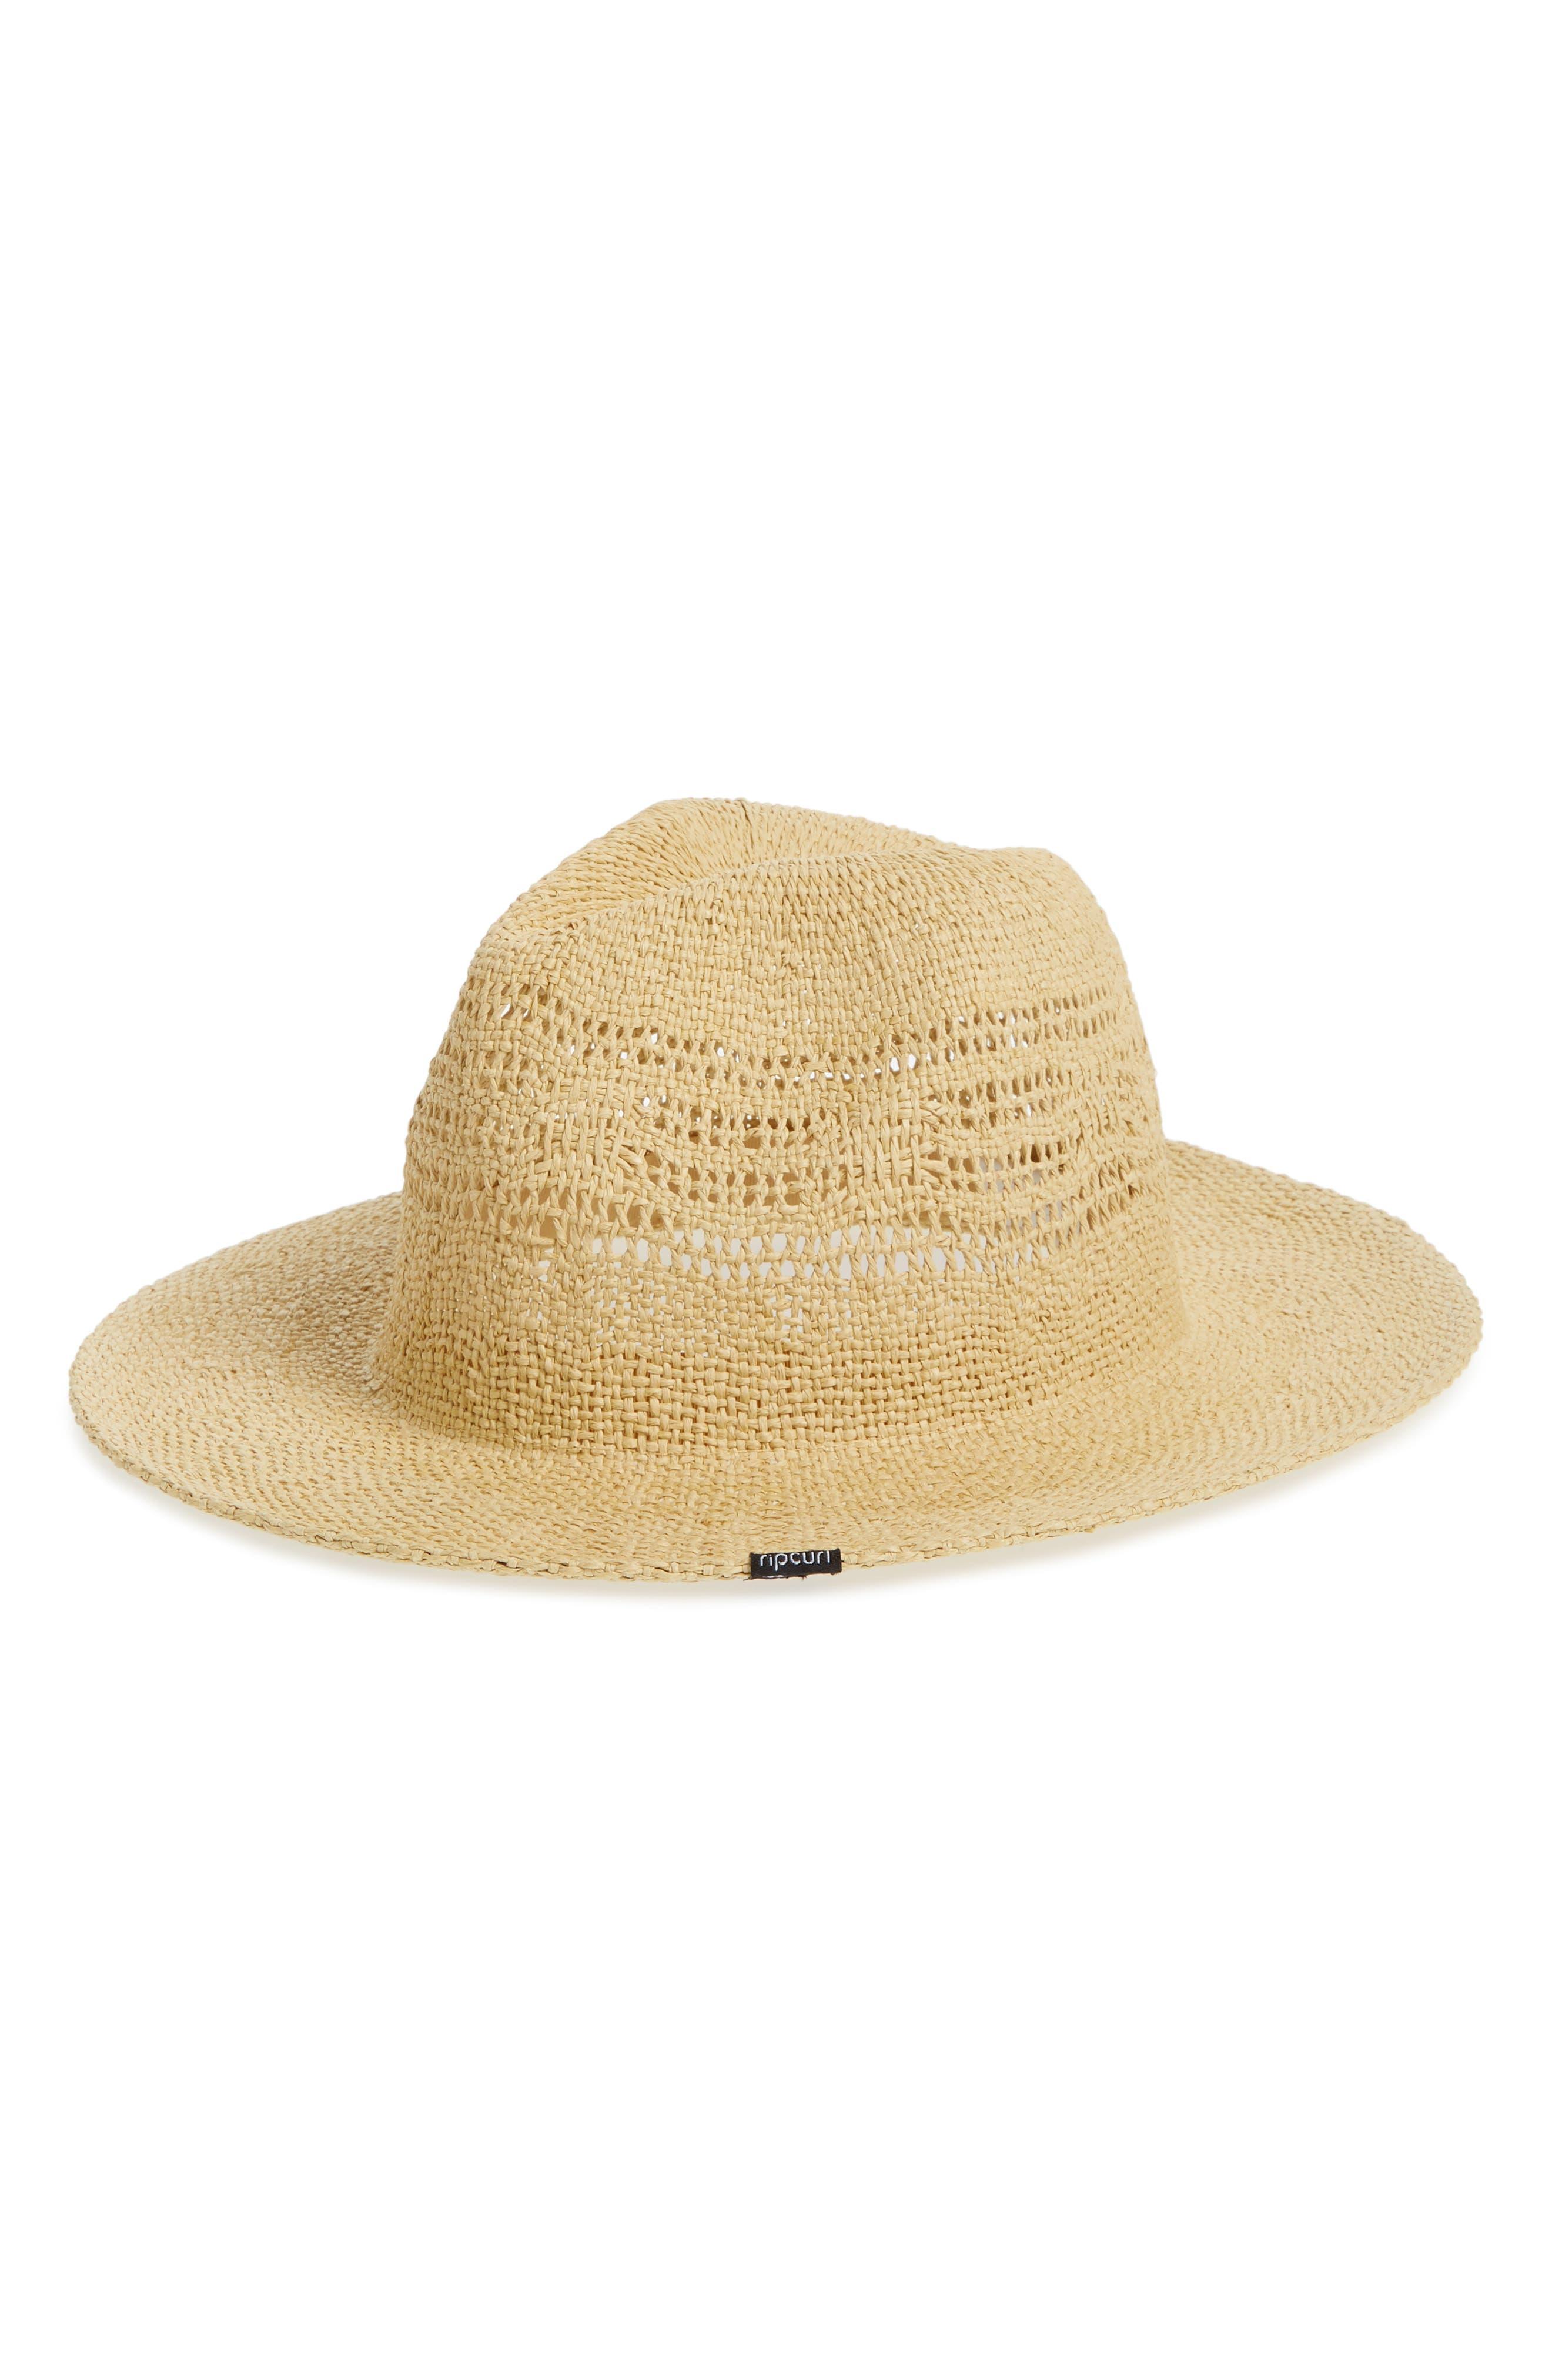 Ritual Panama Straw Hat,                         Main,                         color, Natural